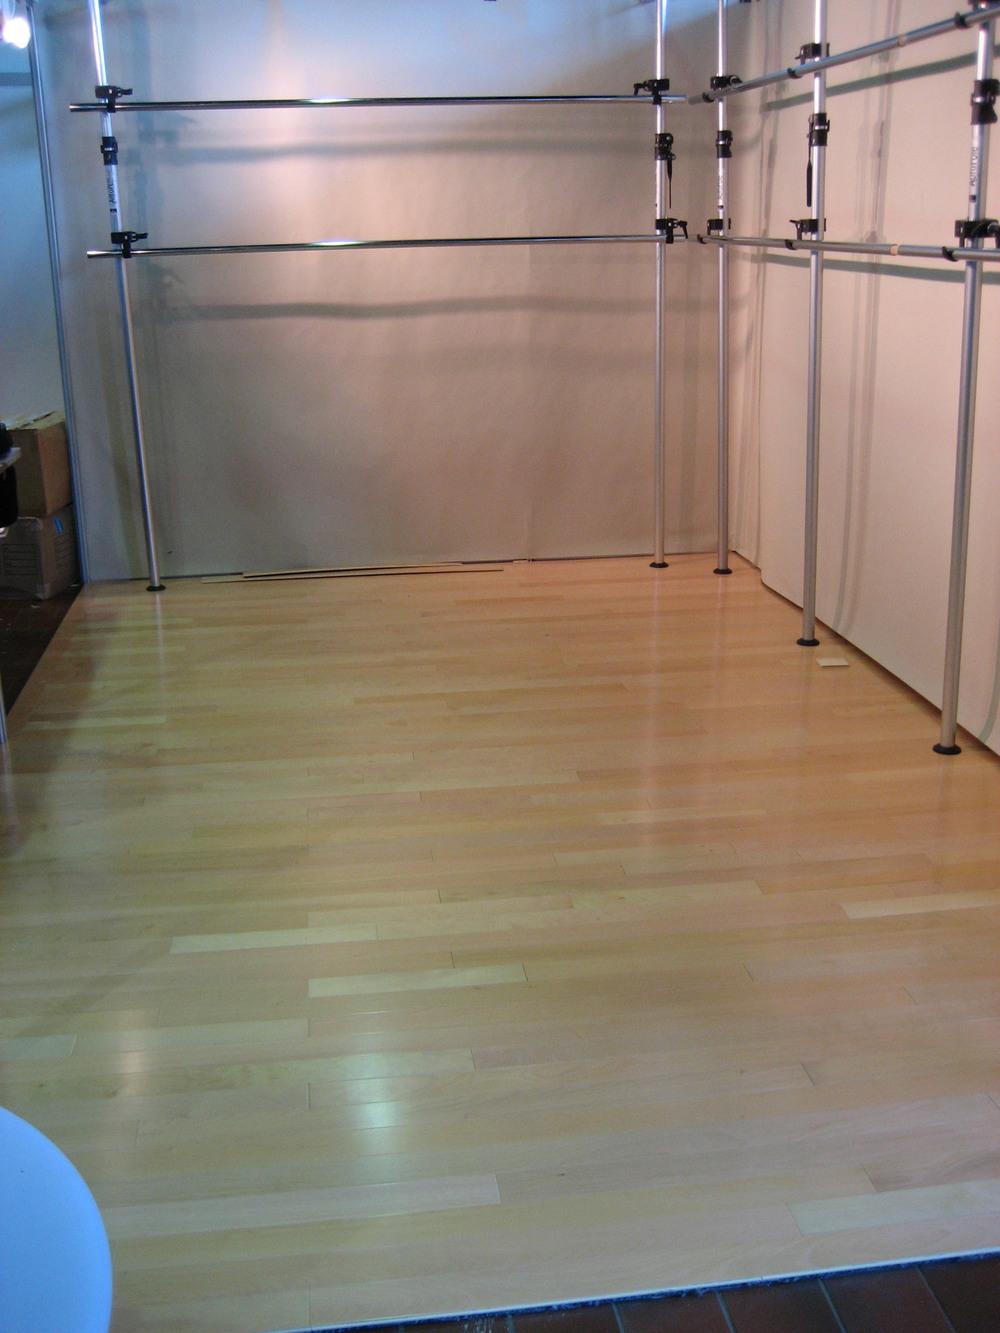 tradeshow-booth-flooring-a1.jpg